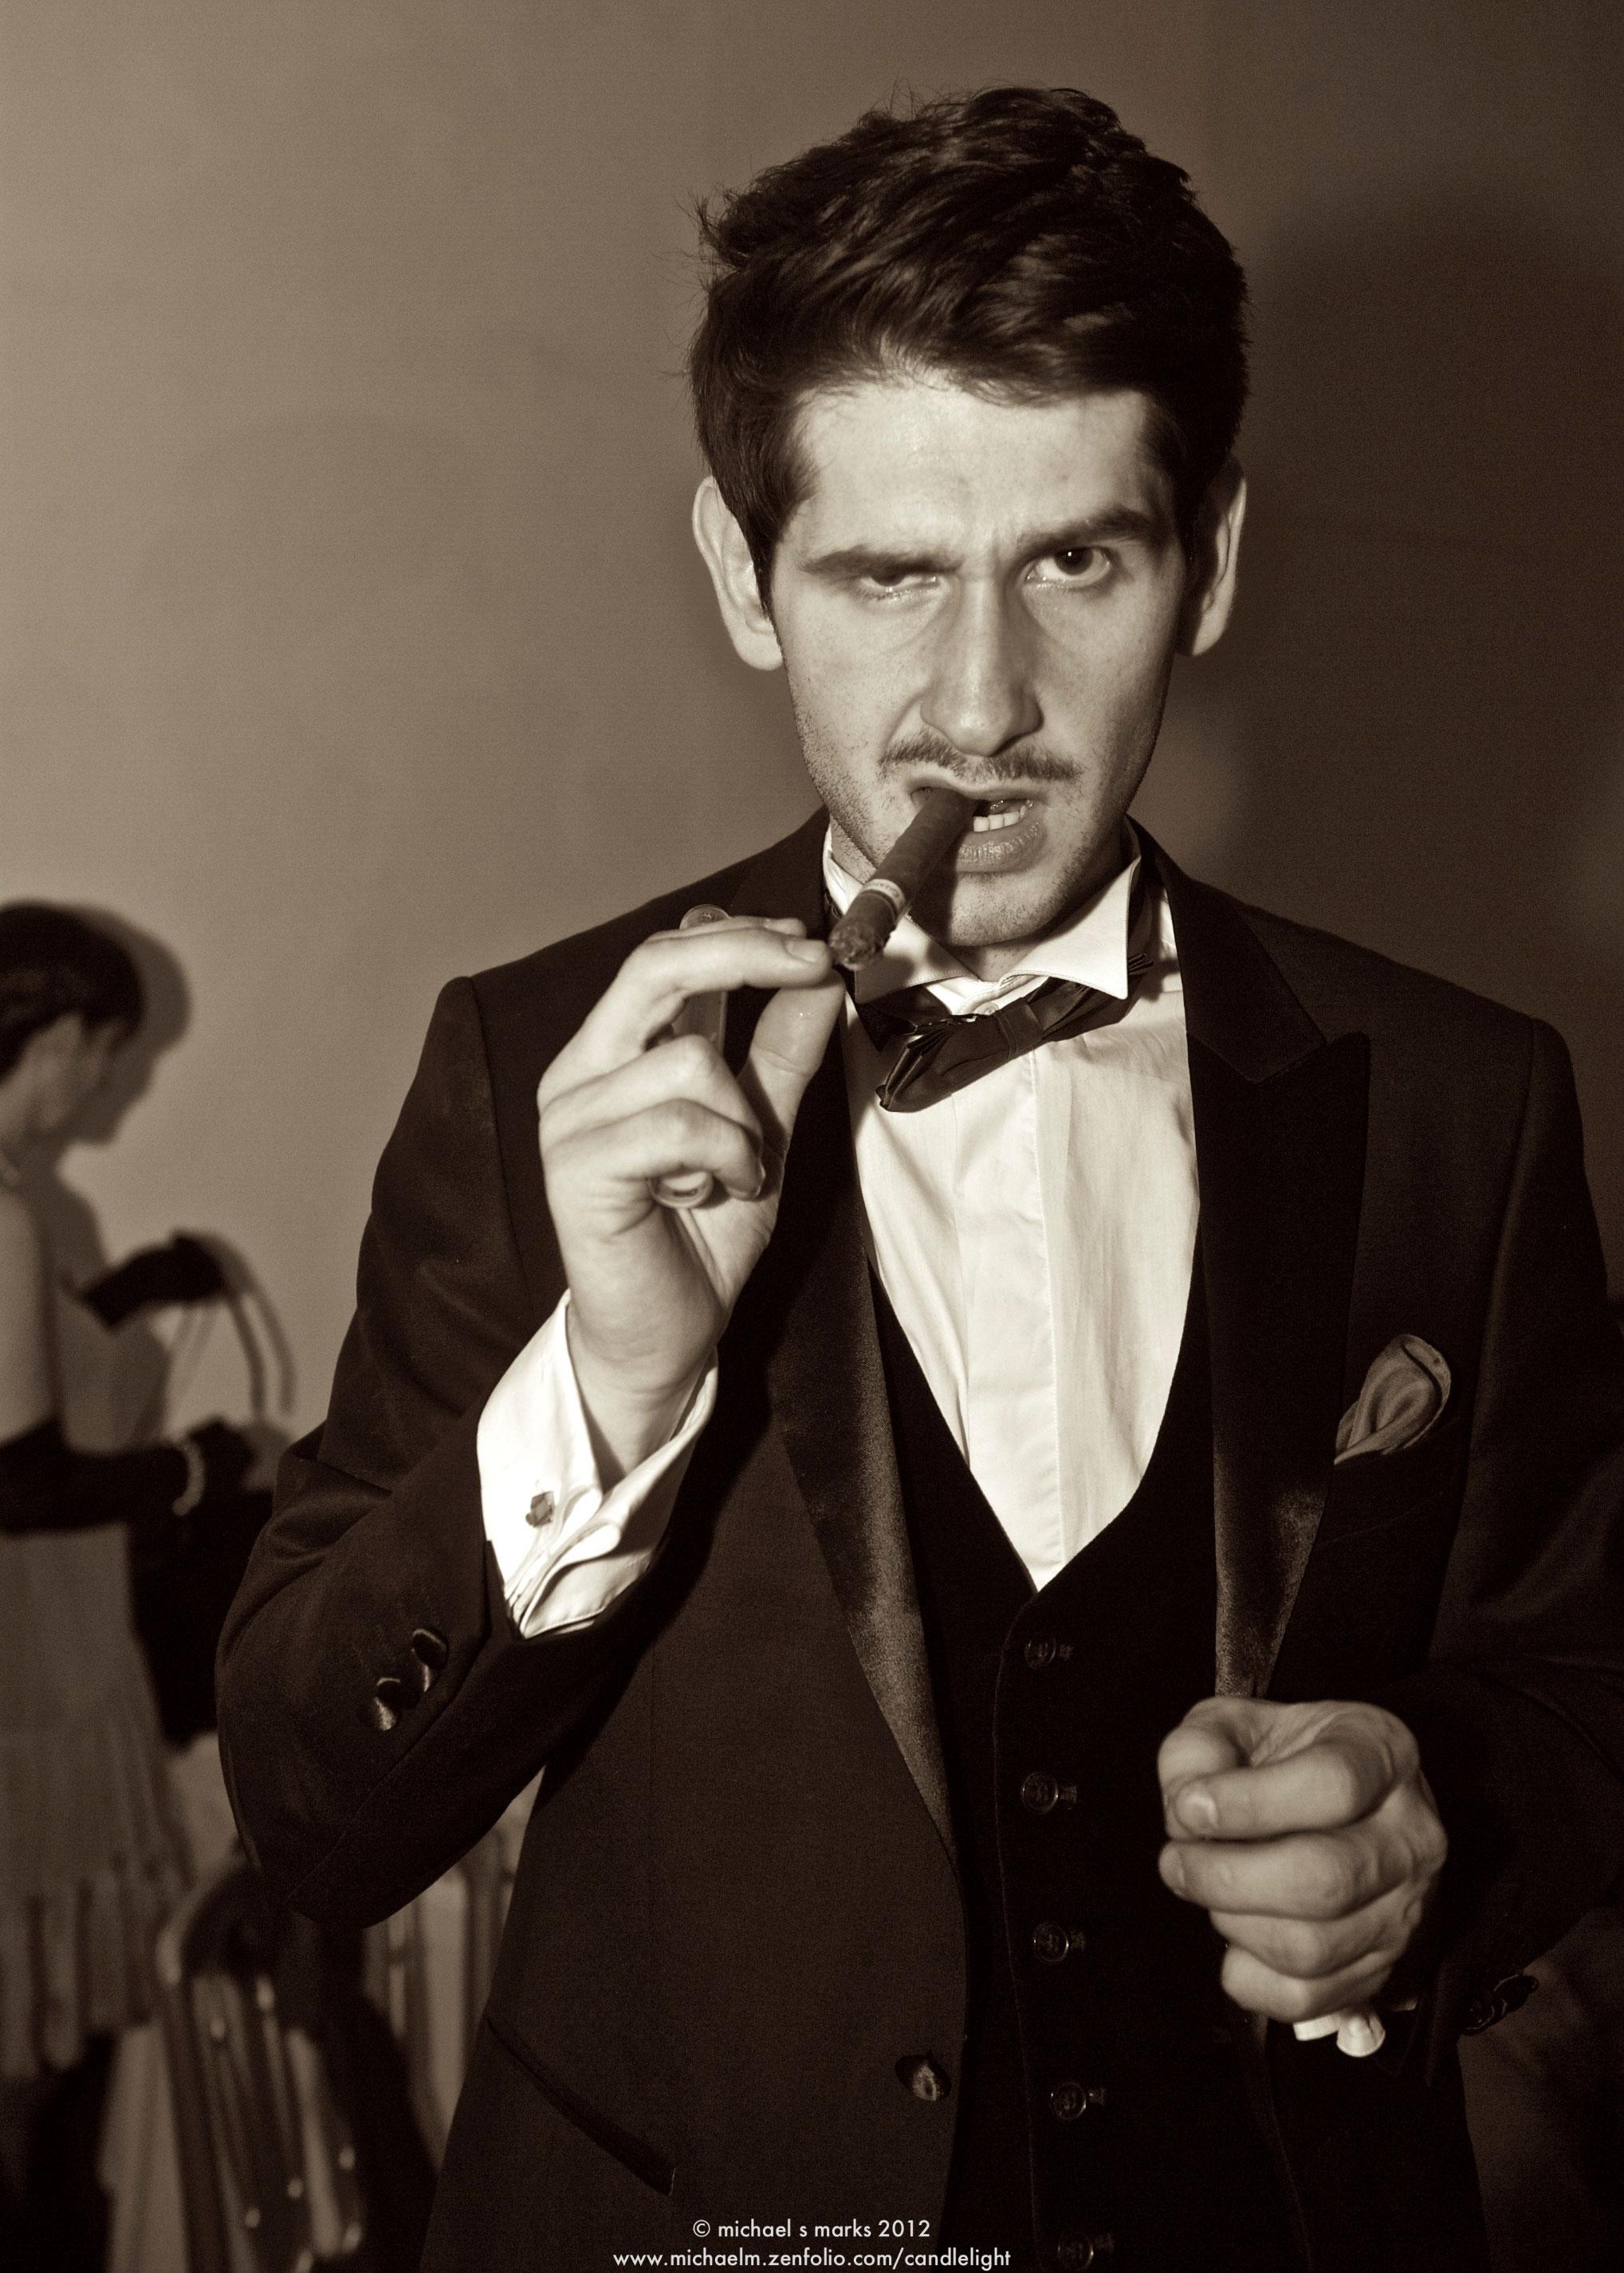 Man in evening wear smoking a cigar